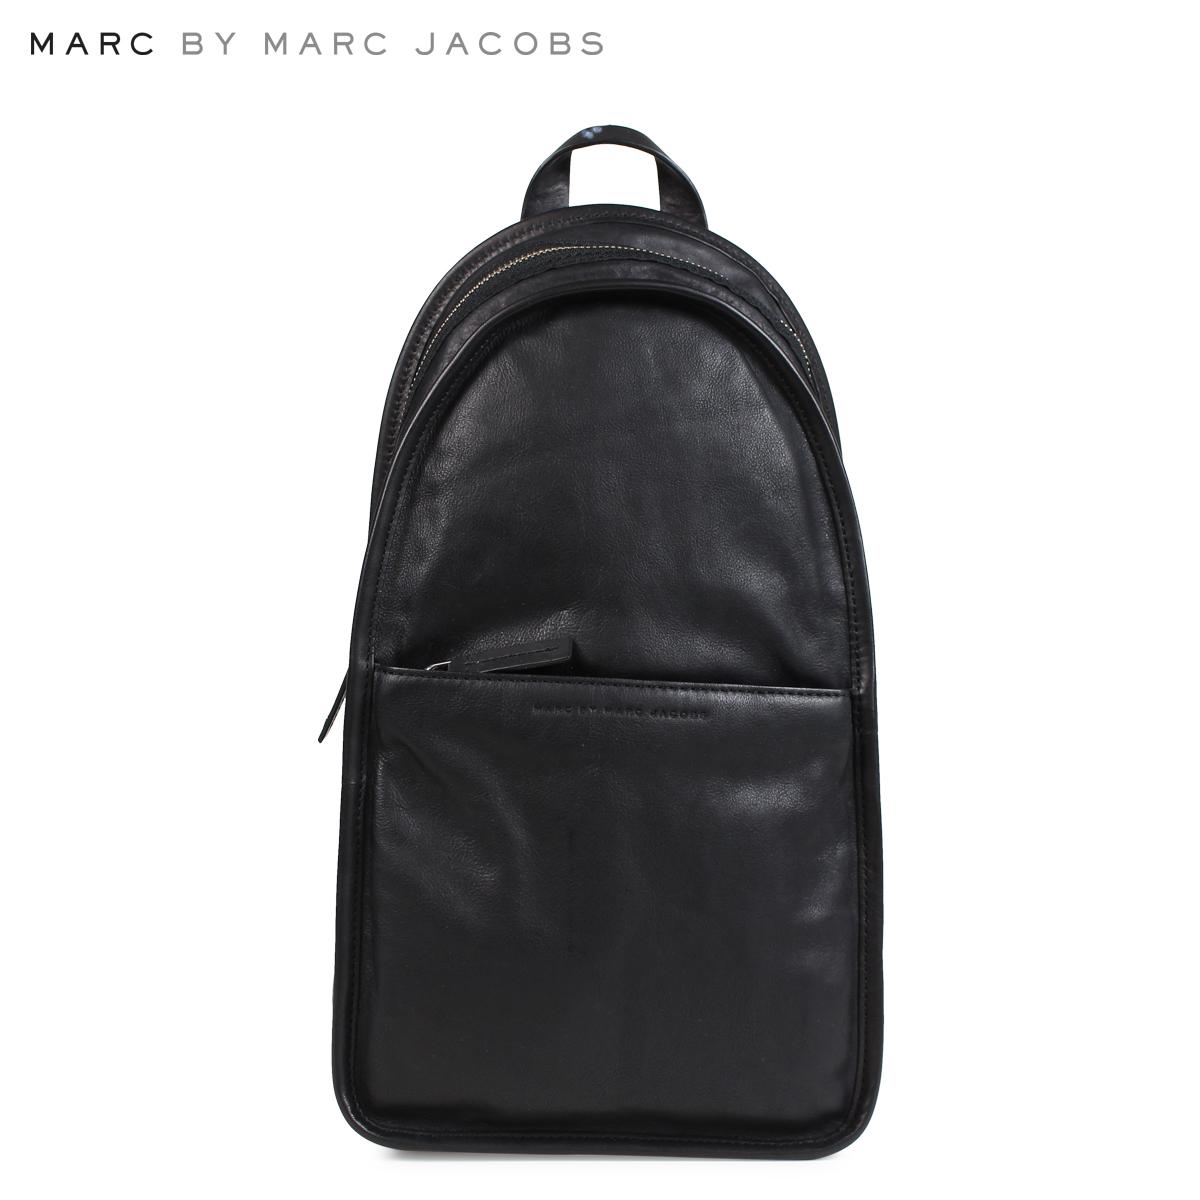 MARC BY MARC JACOBS CROSS BODY BACKPACK マークバイマークジェイコブス バッグ ショルダーバッグ ワンショルダー レディース メンズ ブラック M0001733